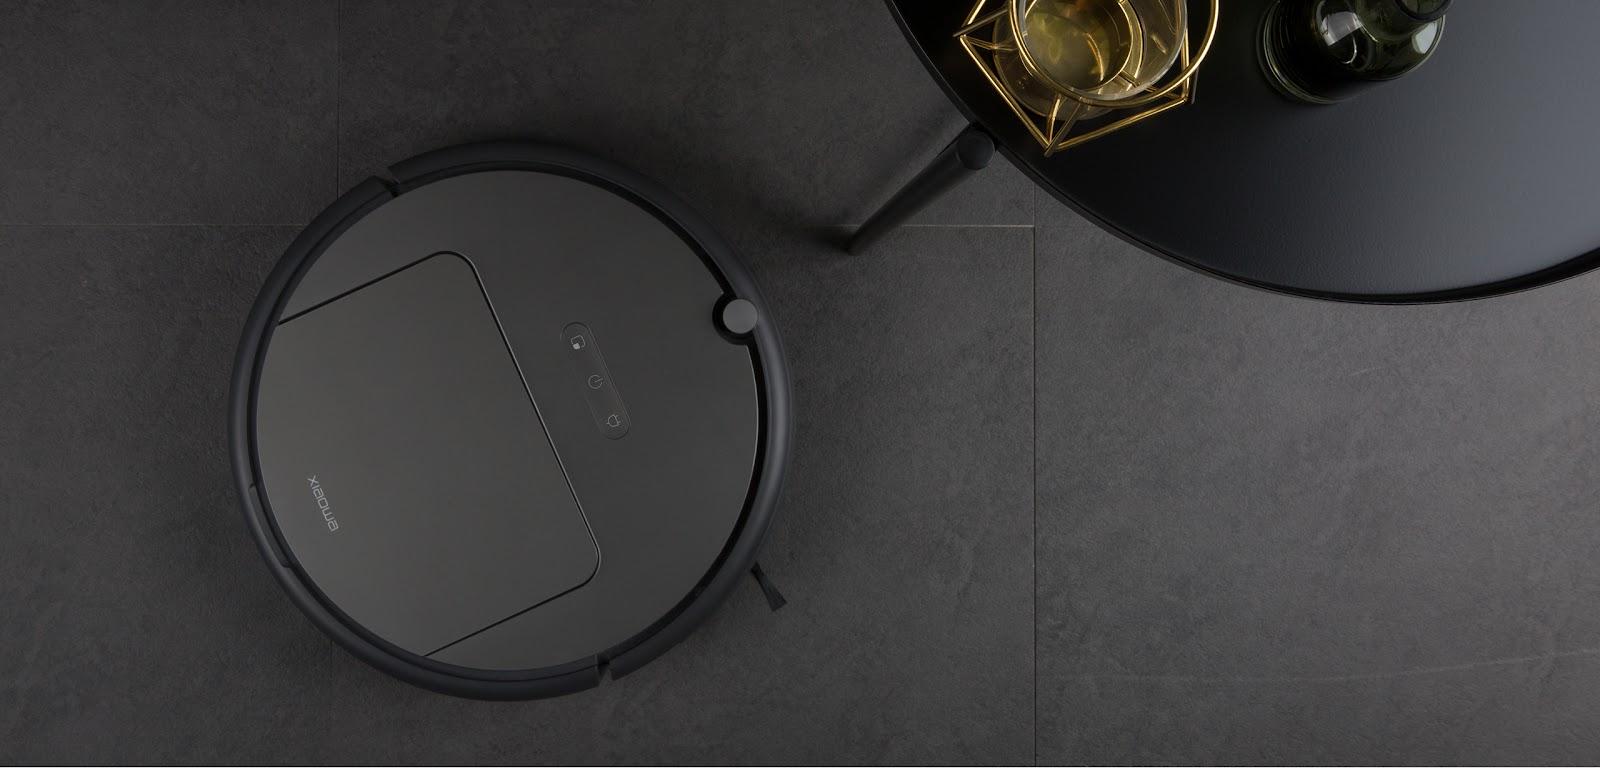 Roborock's versatile smart vacuum lineup is on sale during the Prime Days 6